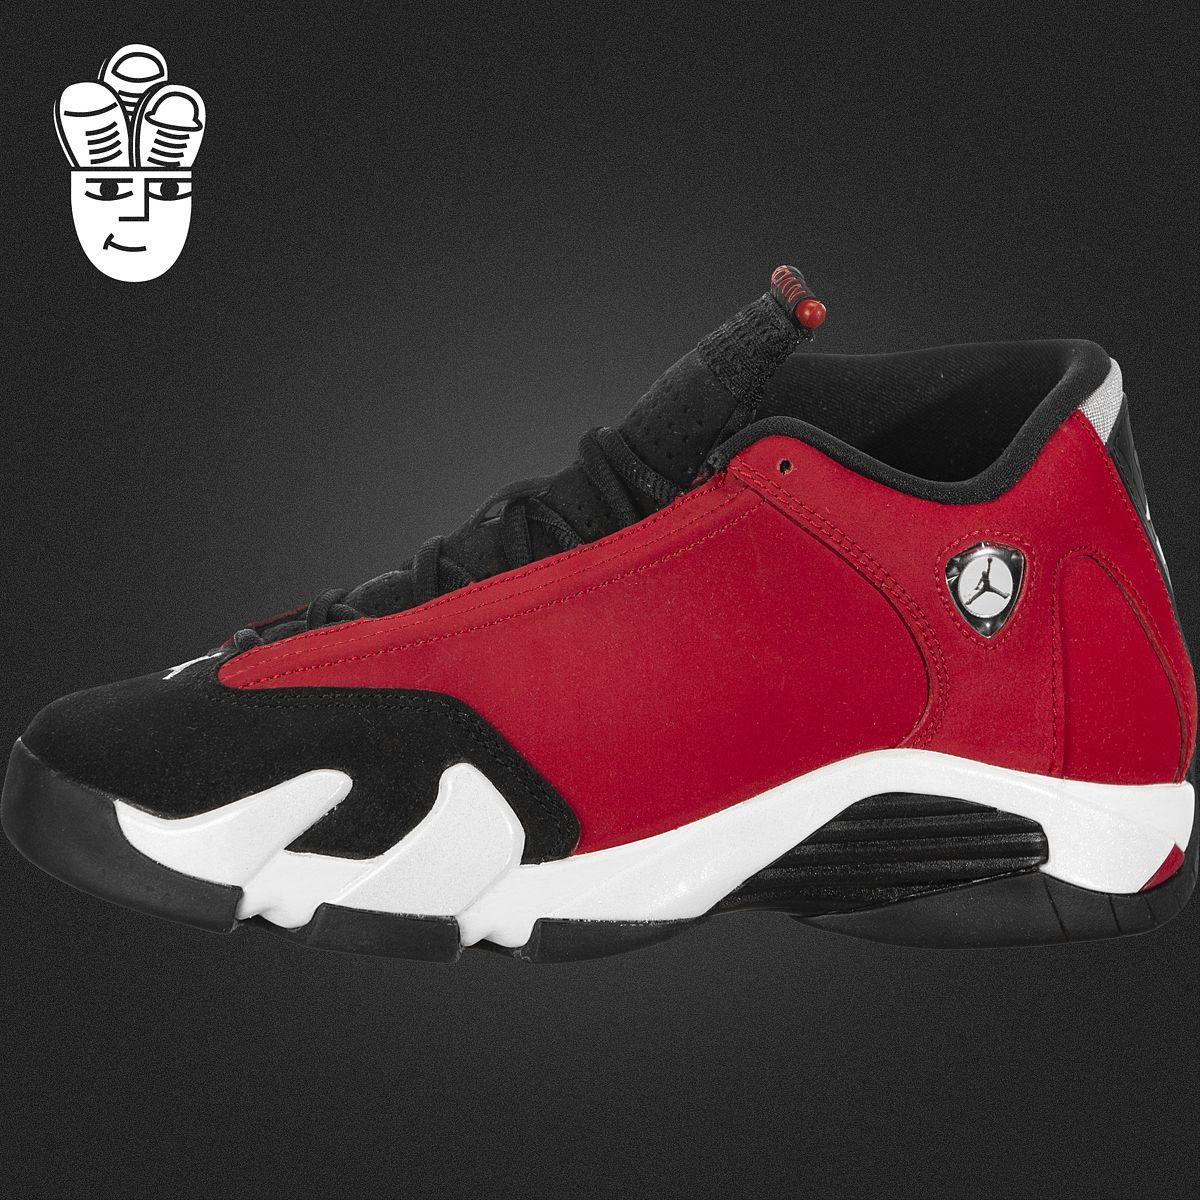 Air Jordan Retro 14 AJ14 男/女鞋 复刻篮球鞋 运动休闲鞋